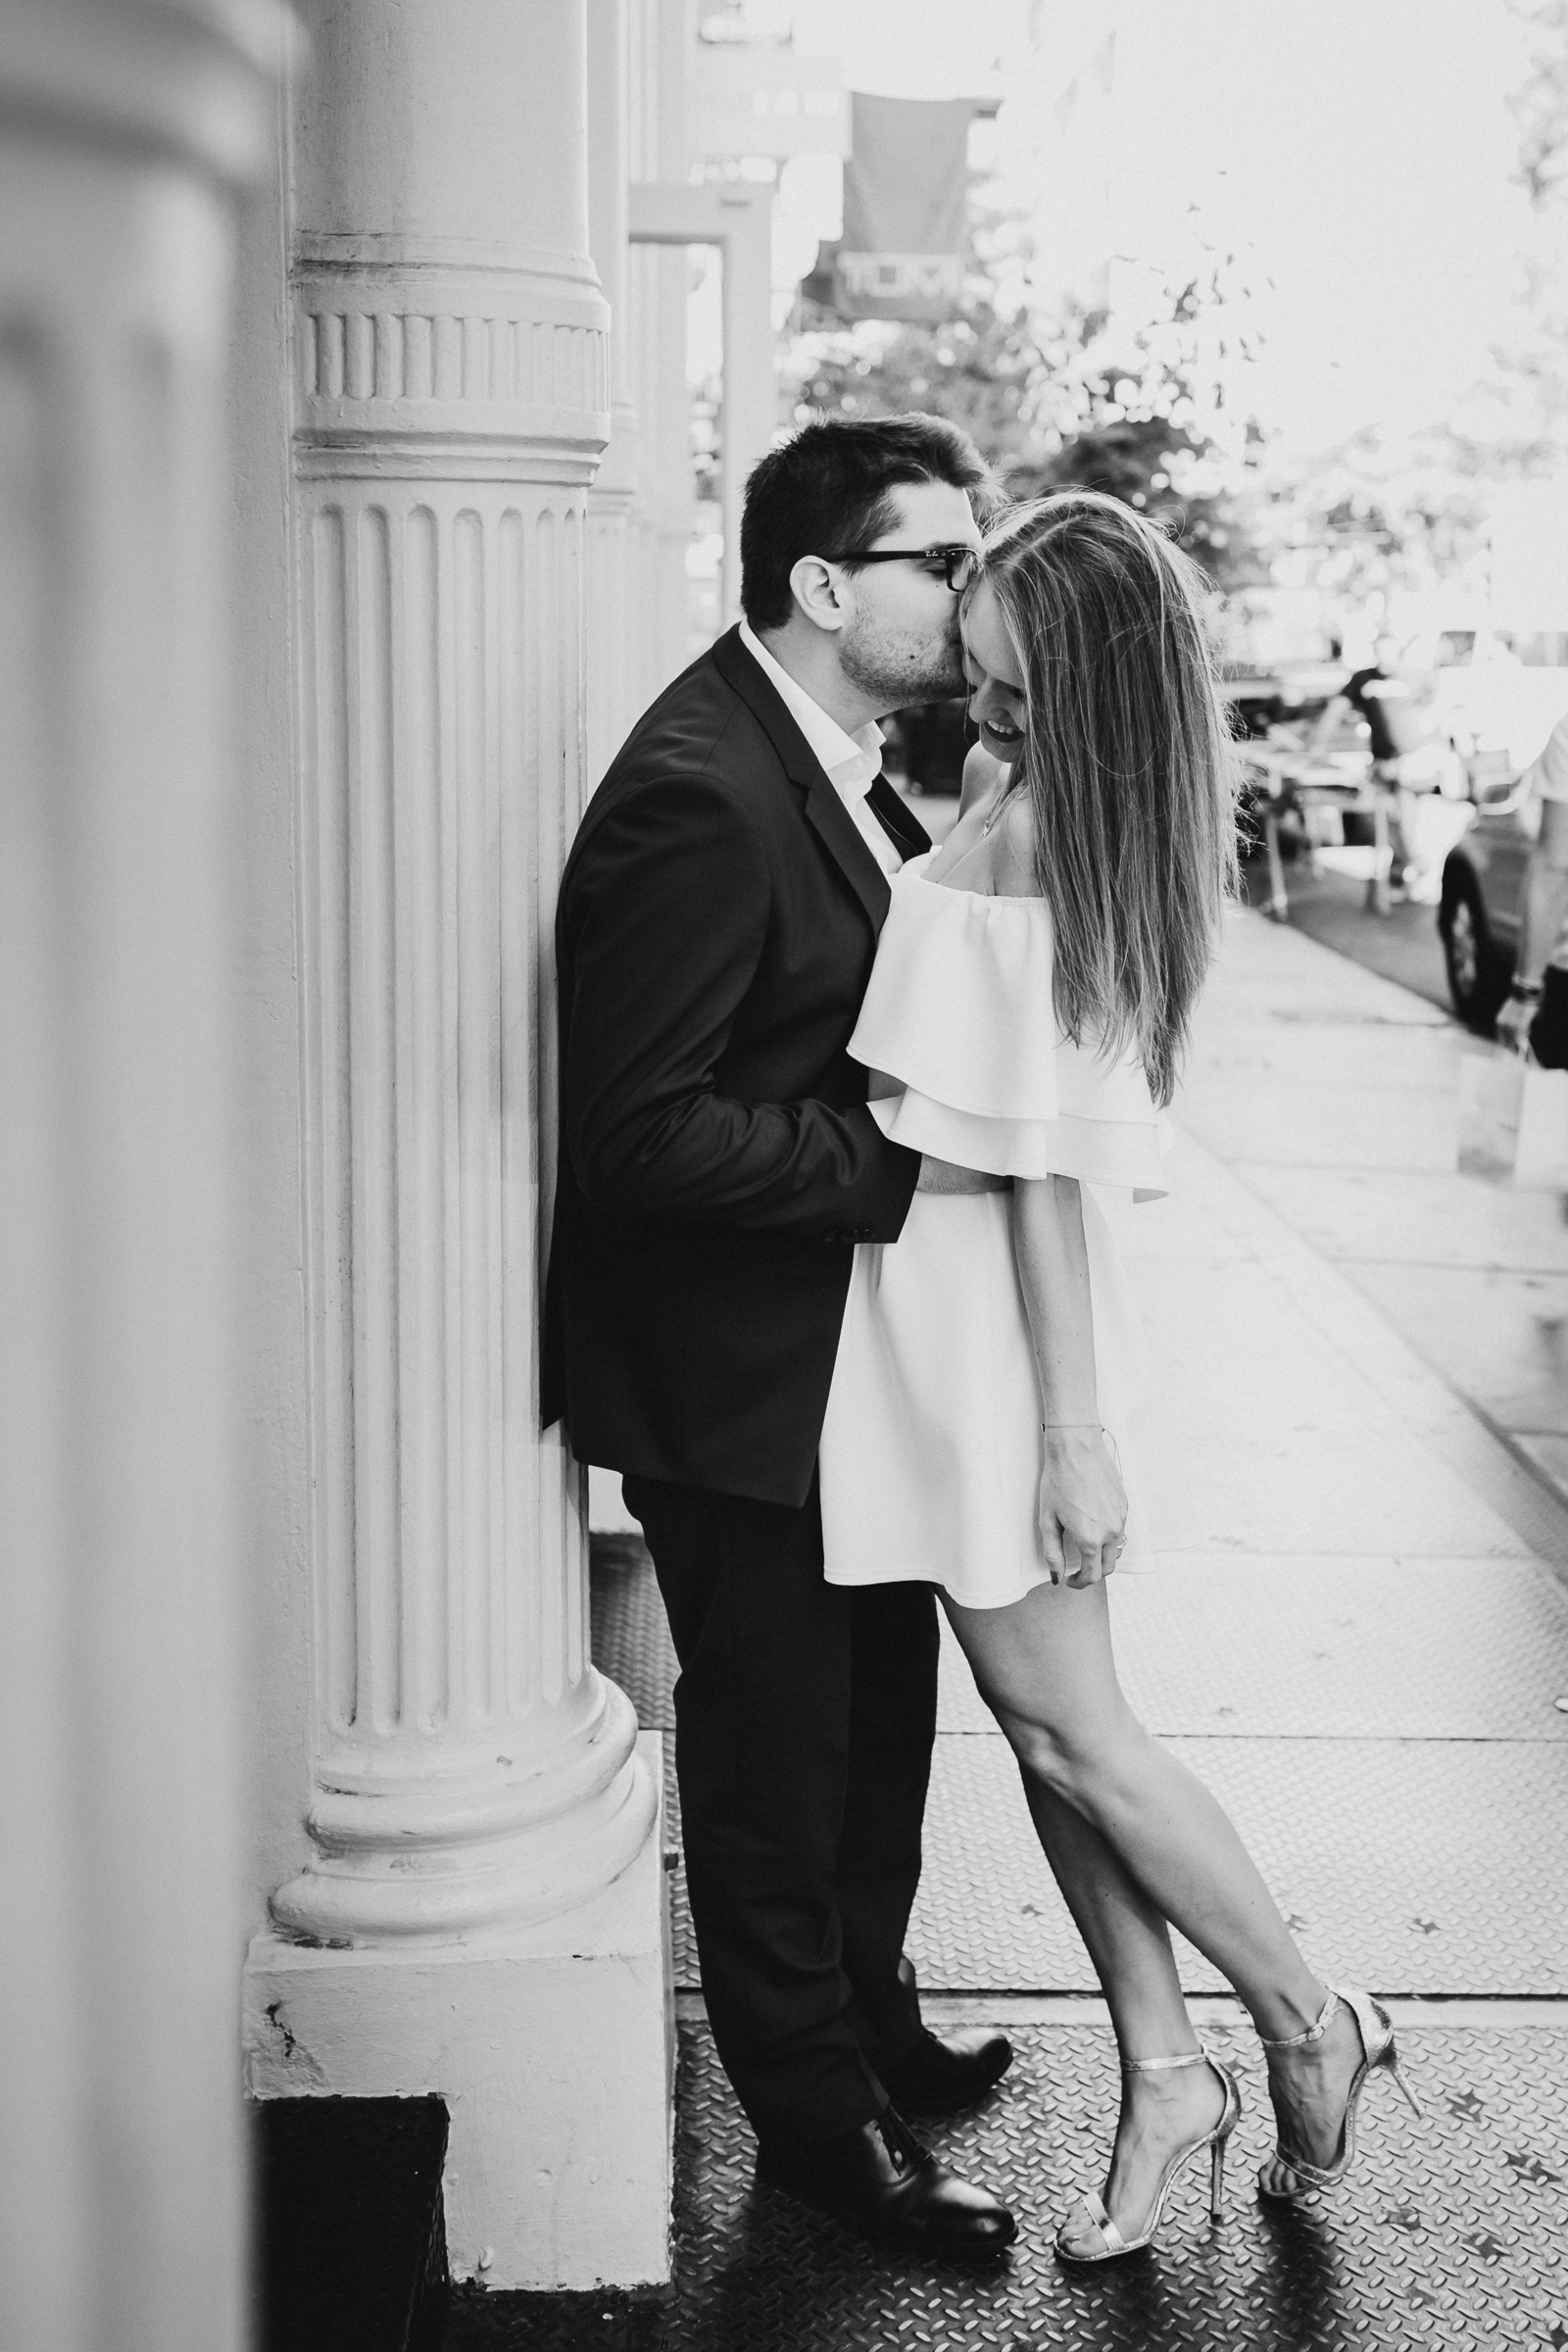 New-York-City-Hall-Elopement-NYC-Documentary-Wedding-Photographer-33.jpg